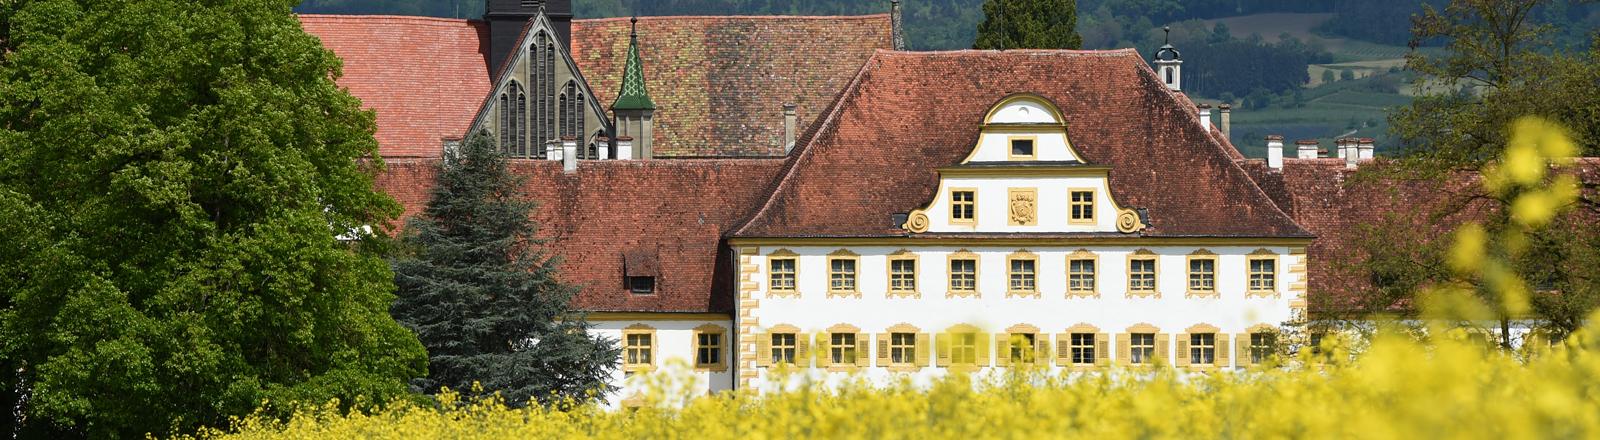 Die Schule Schloss Salem ist am 08.05.2014 (Baden-Württemberg) hinter einem Rapsfeld zu sehen. Foto: Felix Kästle/dpa